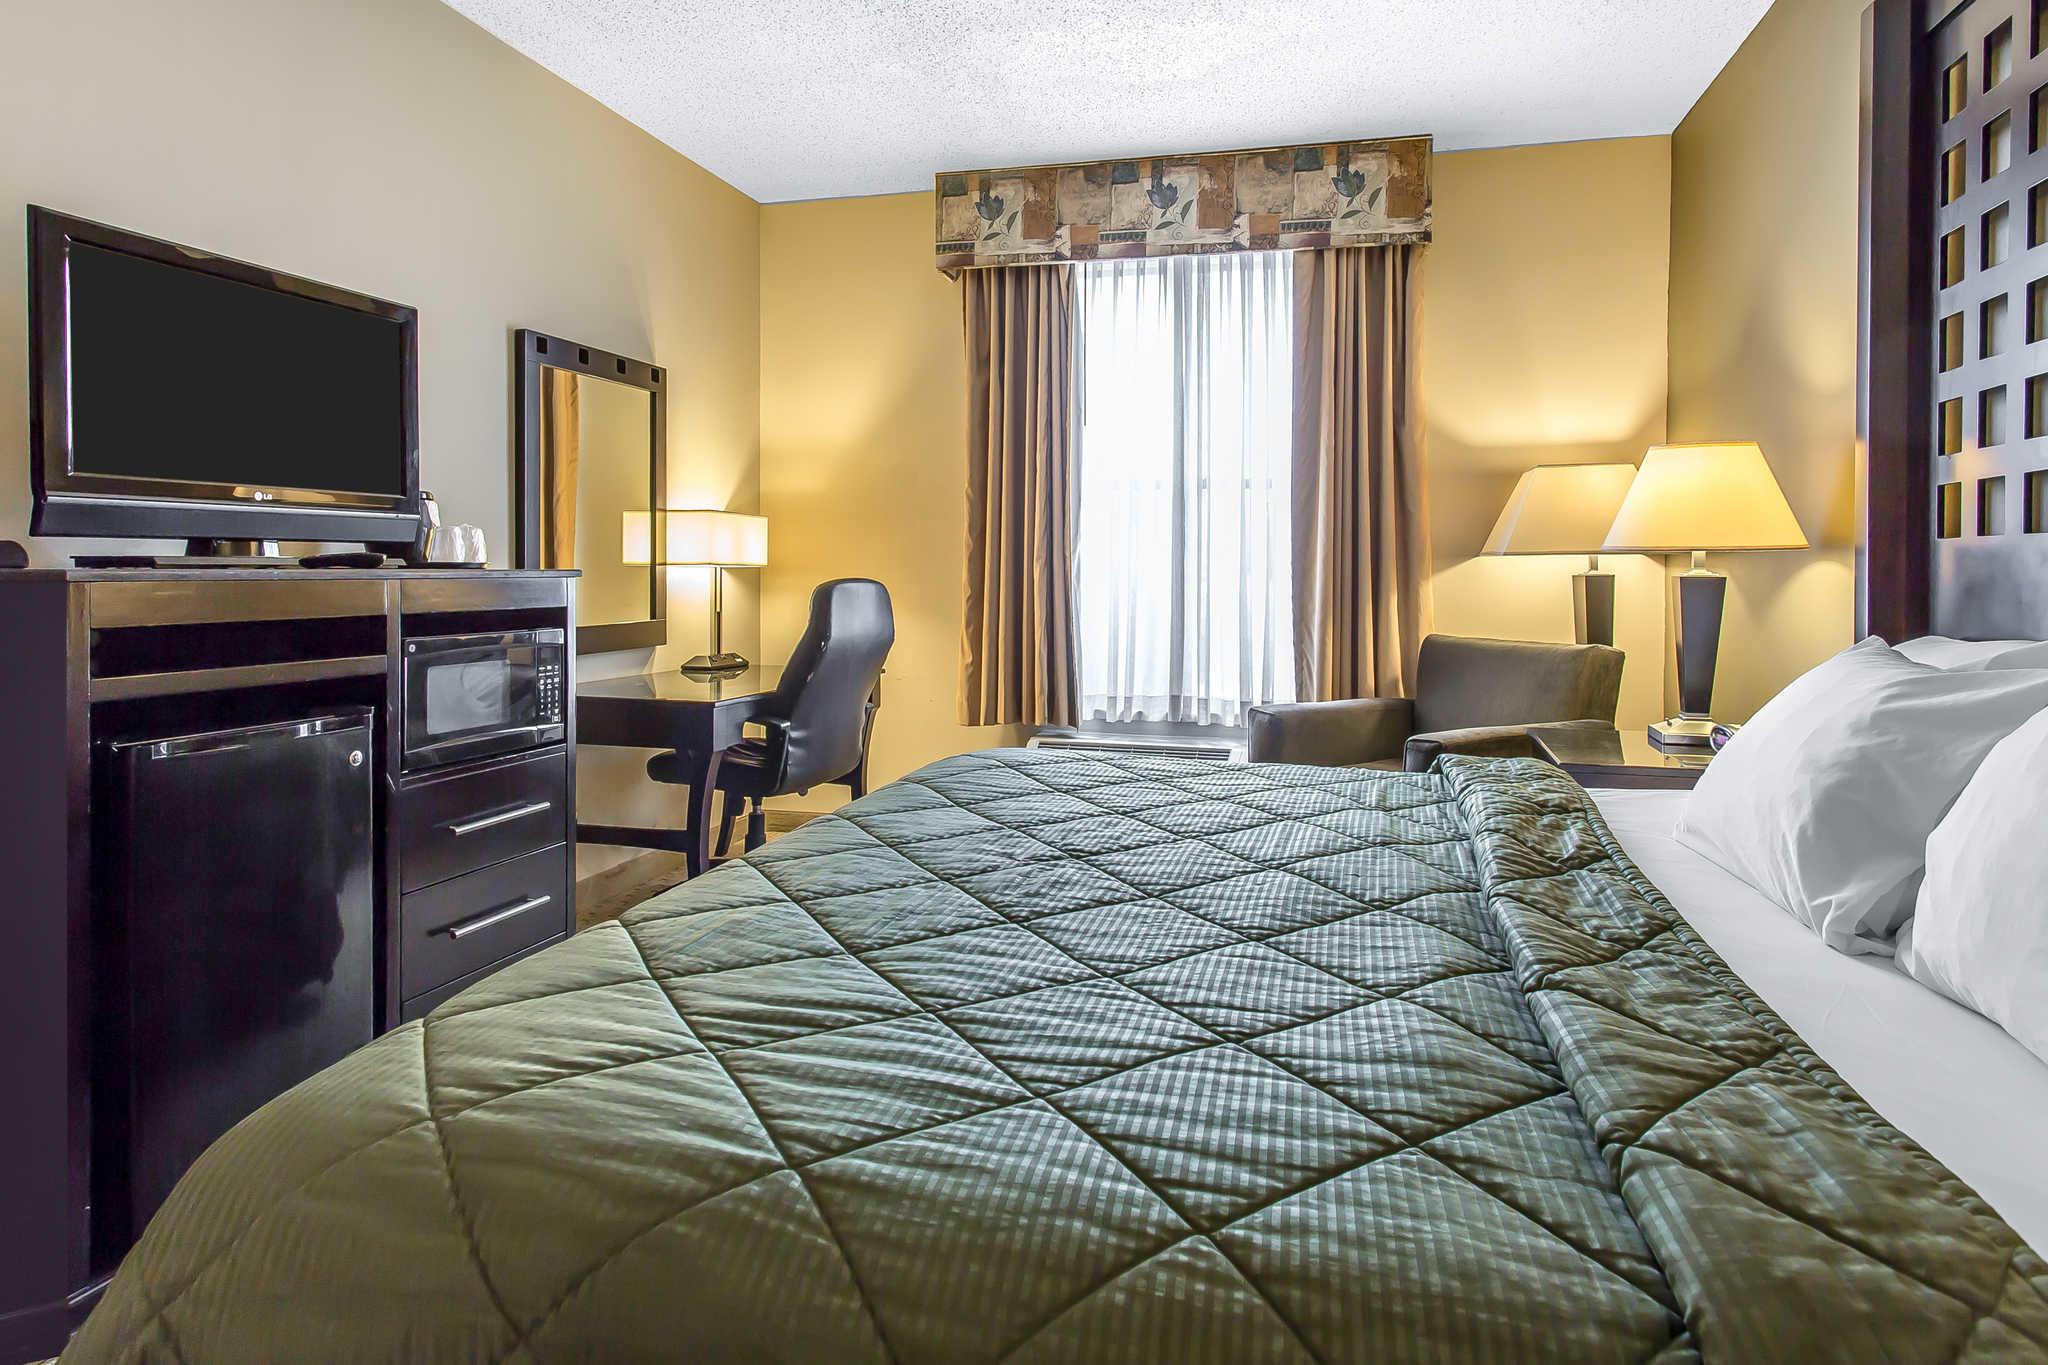 Quality Inn & Suites Durant image 9